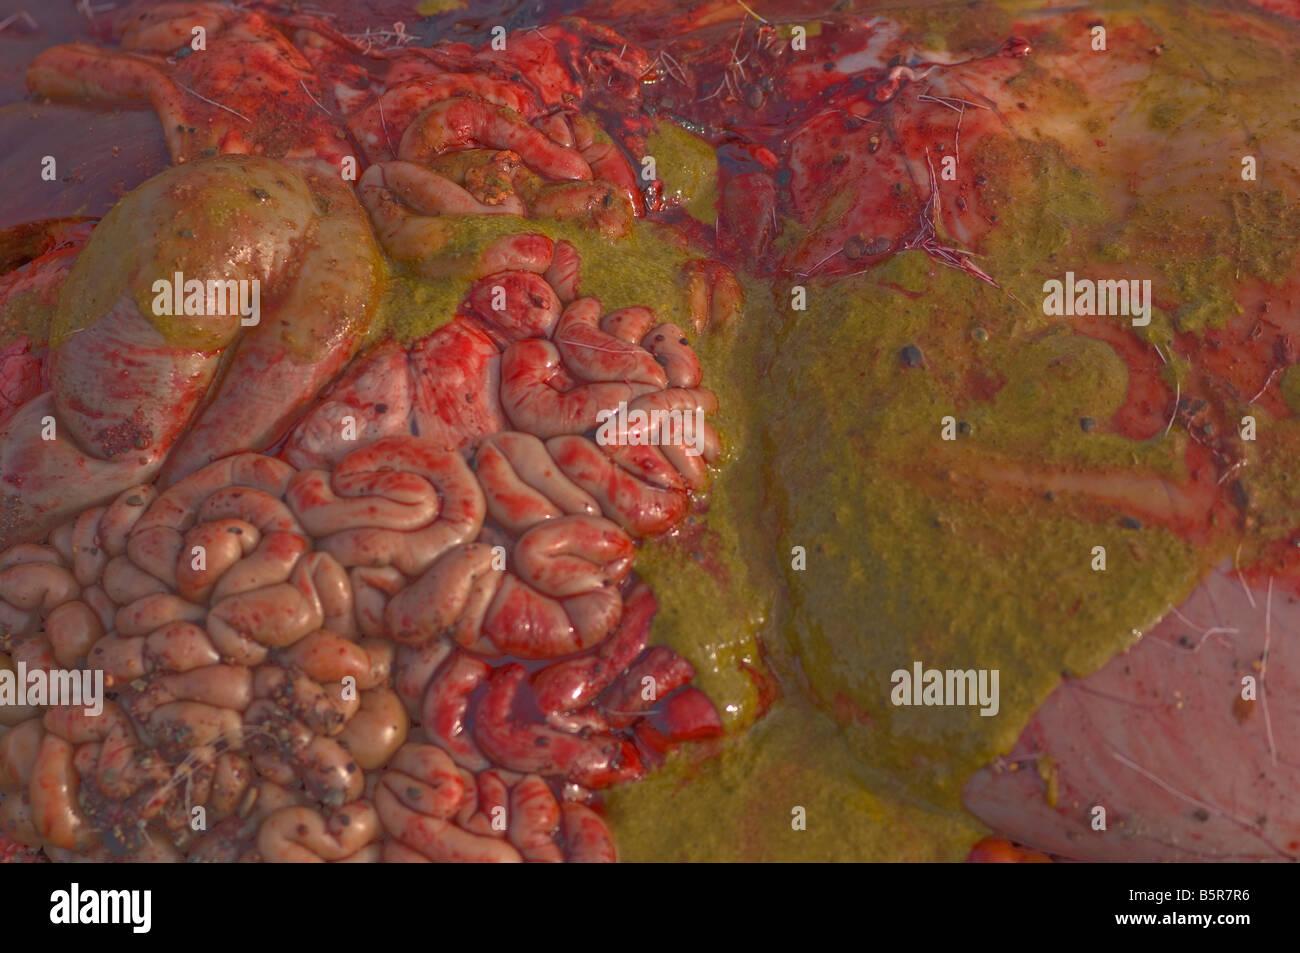 intestines bile blood caribou ungulate mammal animal - Stock Image